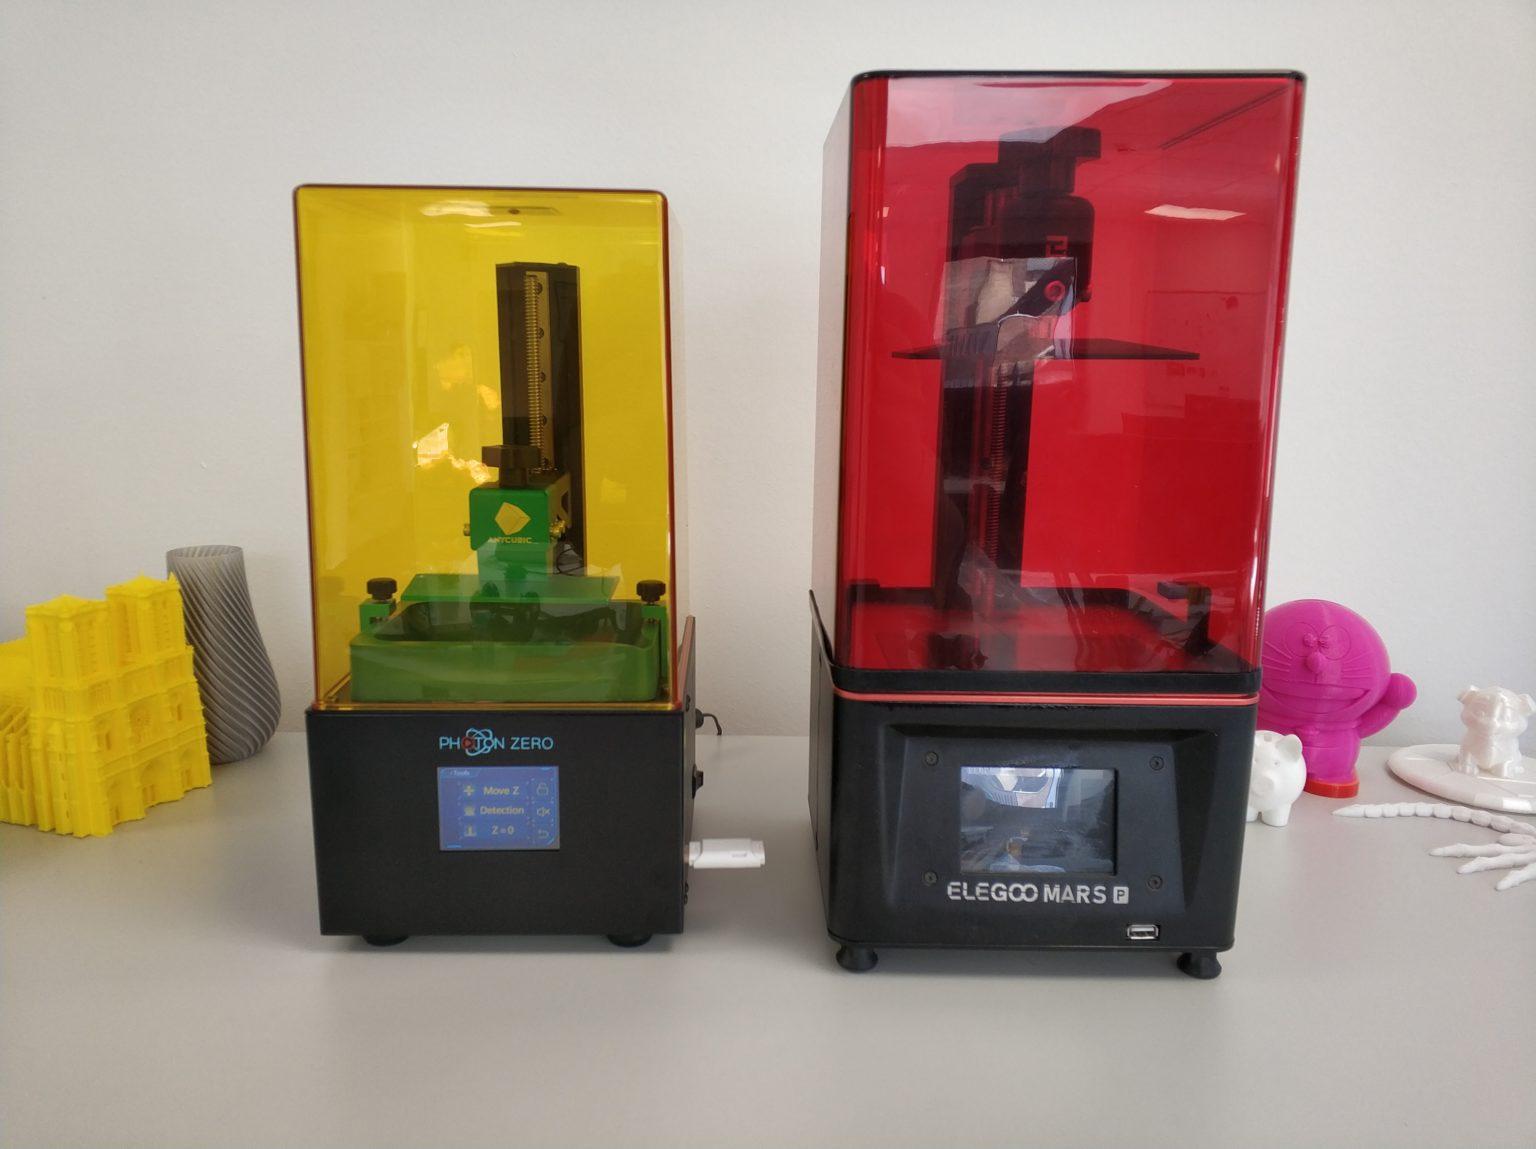 Impresora SLA Anycubic Photon Zero y Elegoo Mars Pro